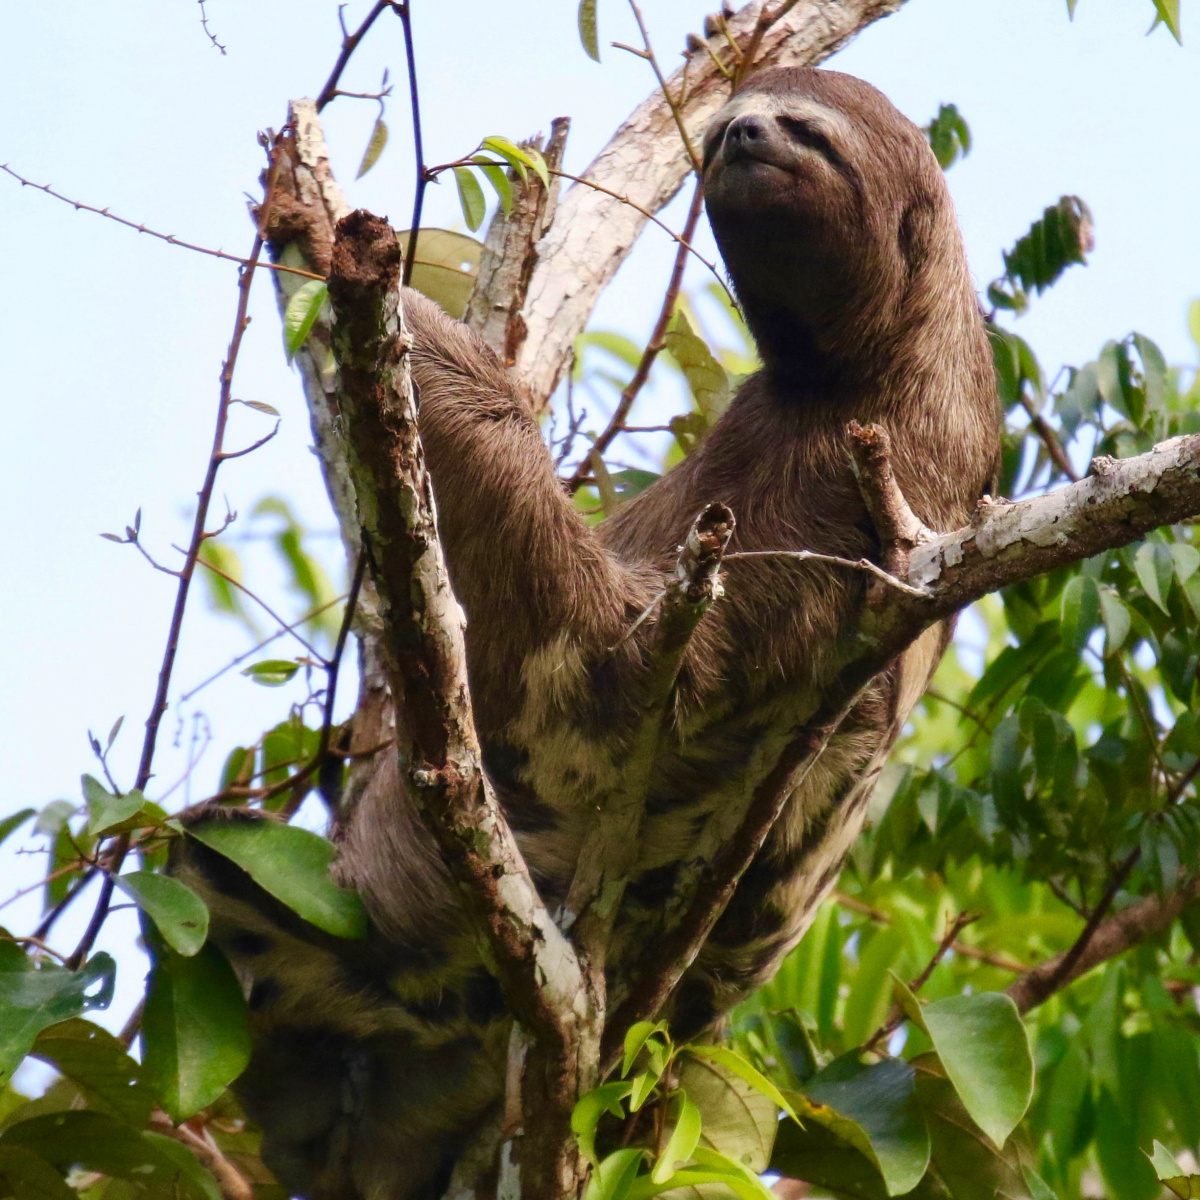 Brown three-toed sloth